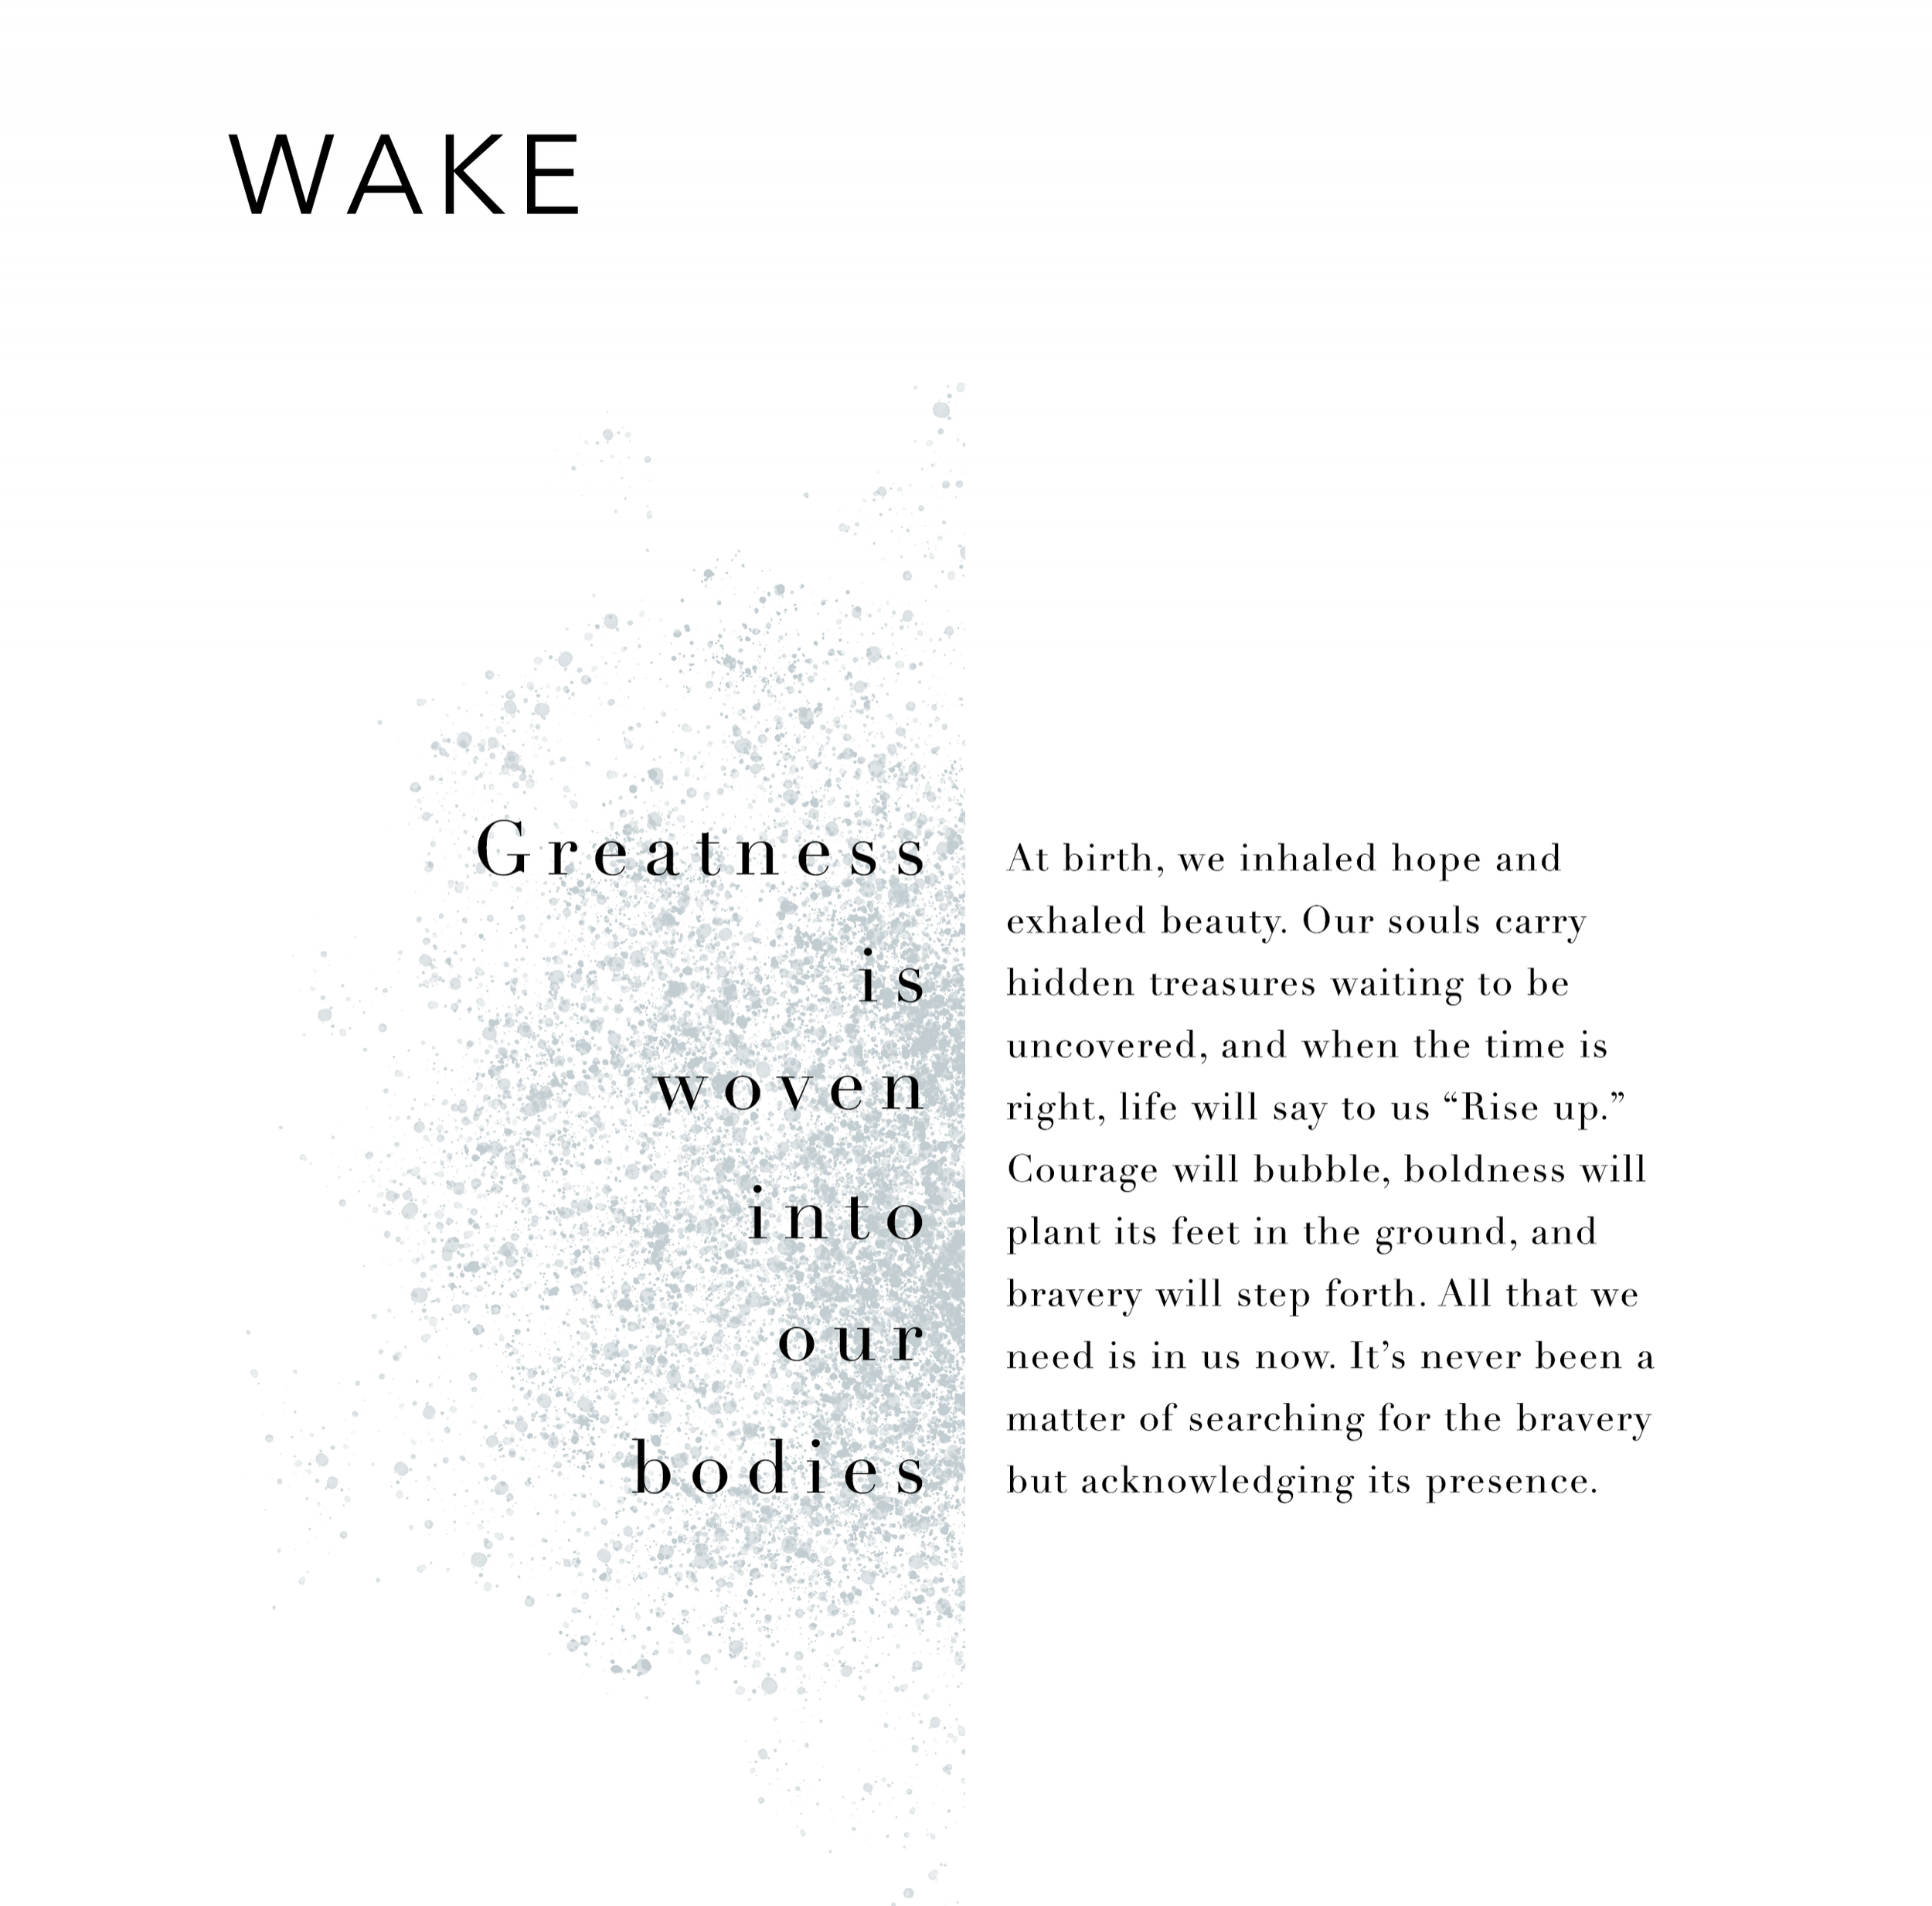 BR Wake PG 2.png